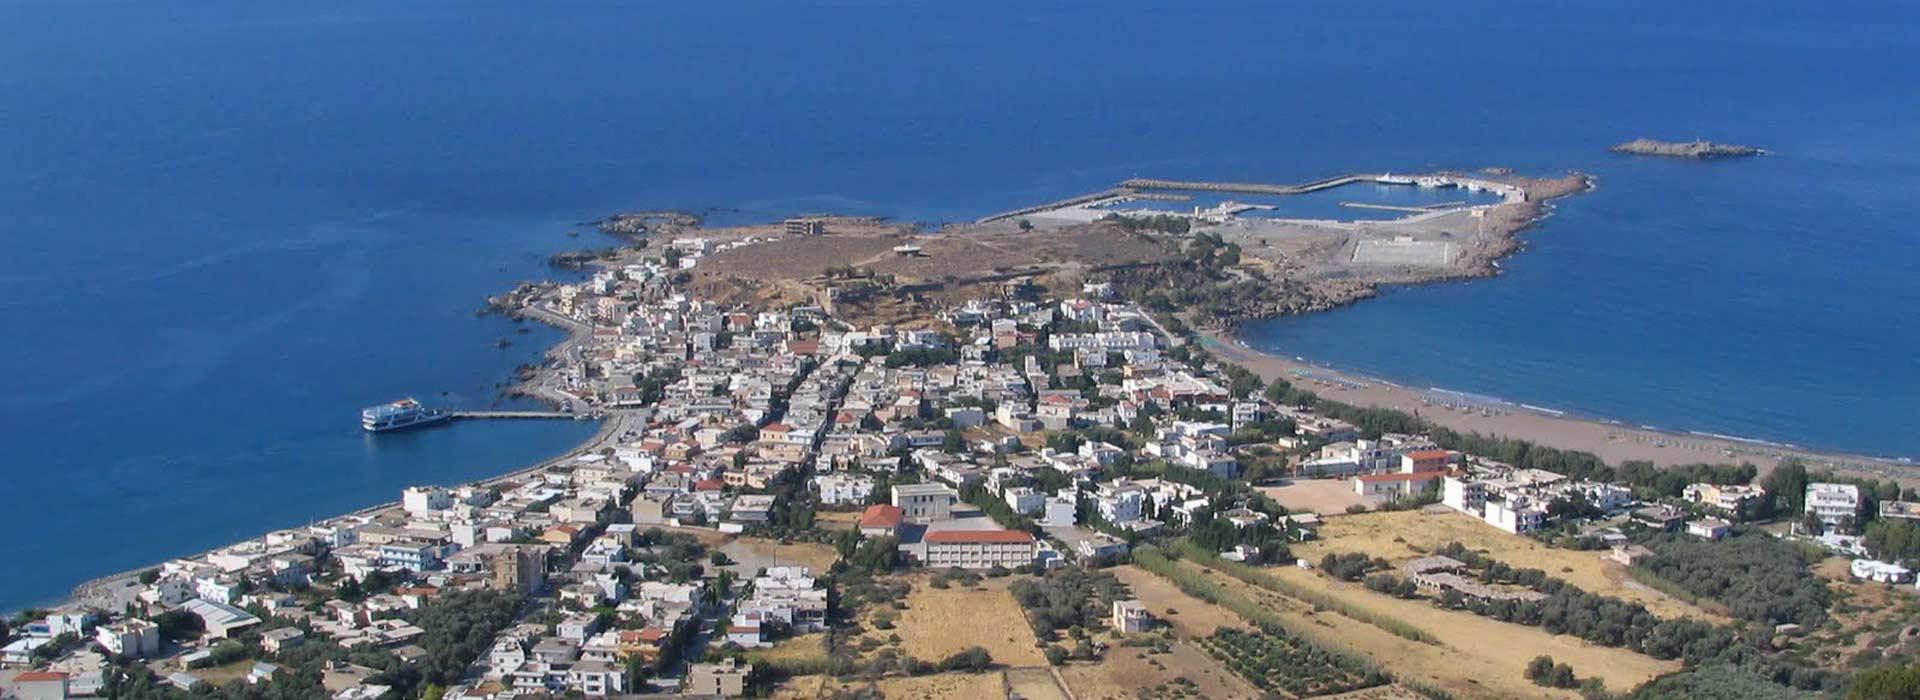 Palaiochora Crete Greece